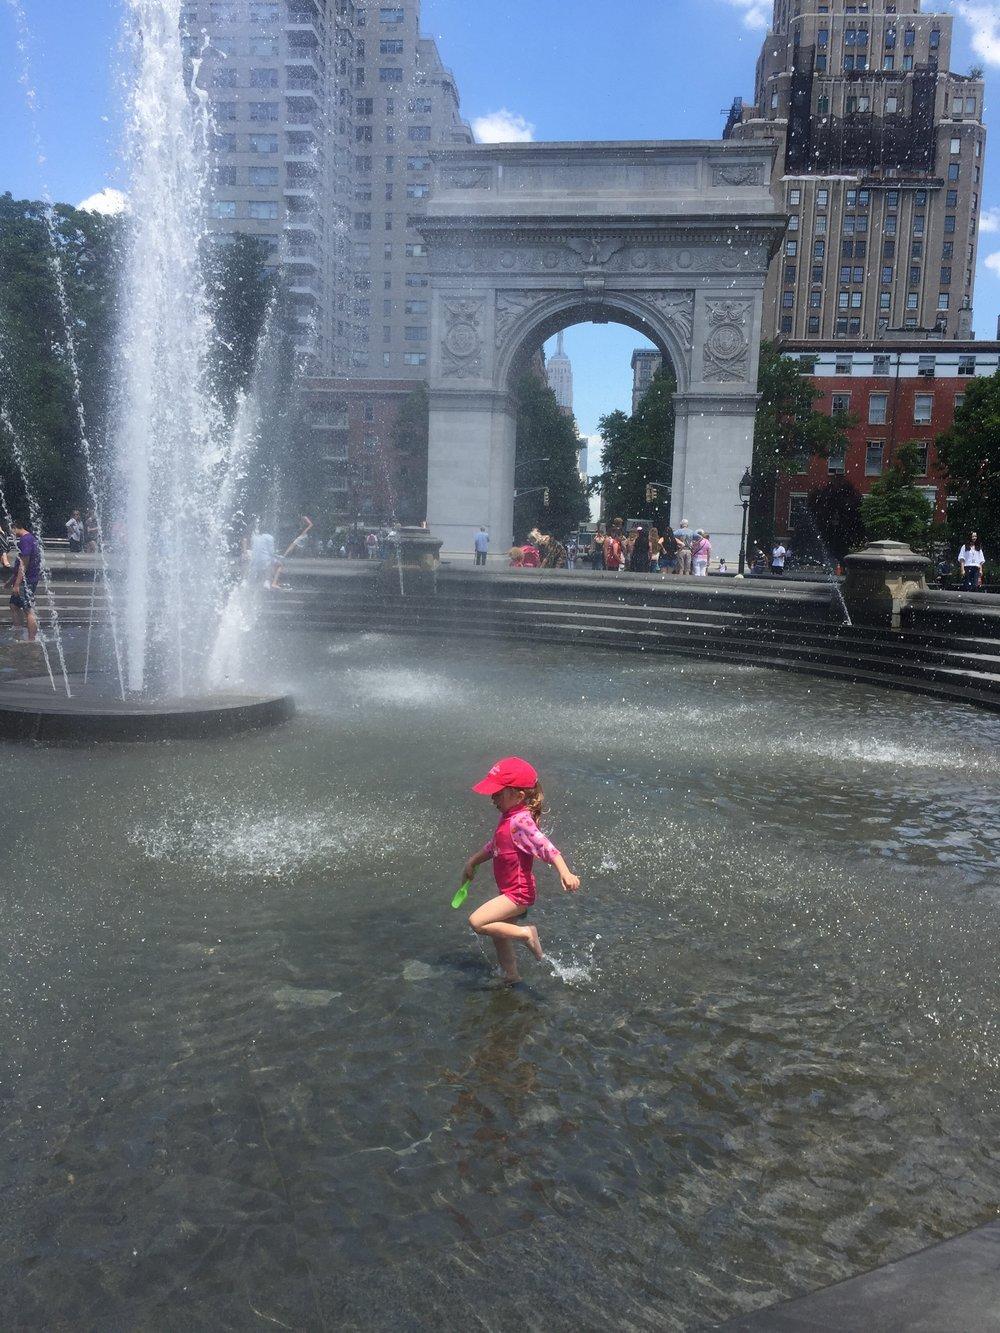 Splashing around the Washington Square Park fountain.